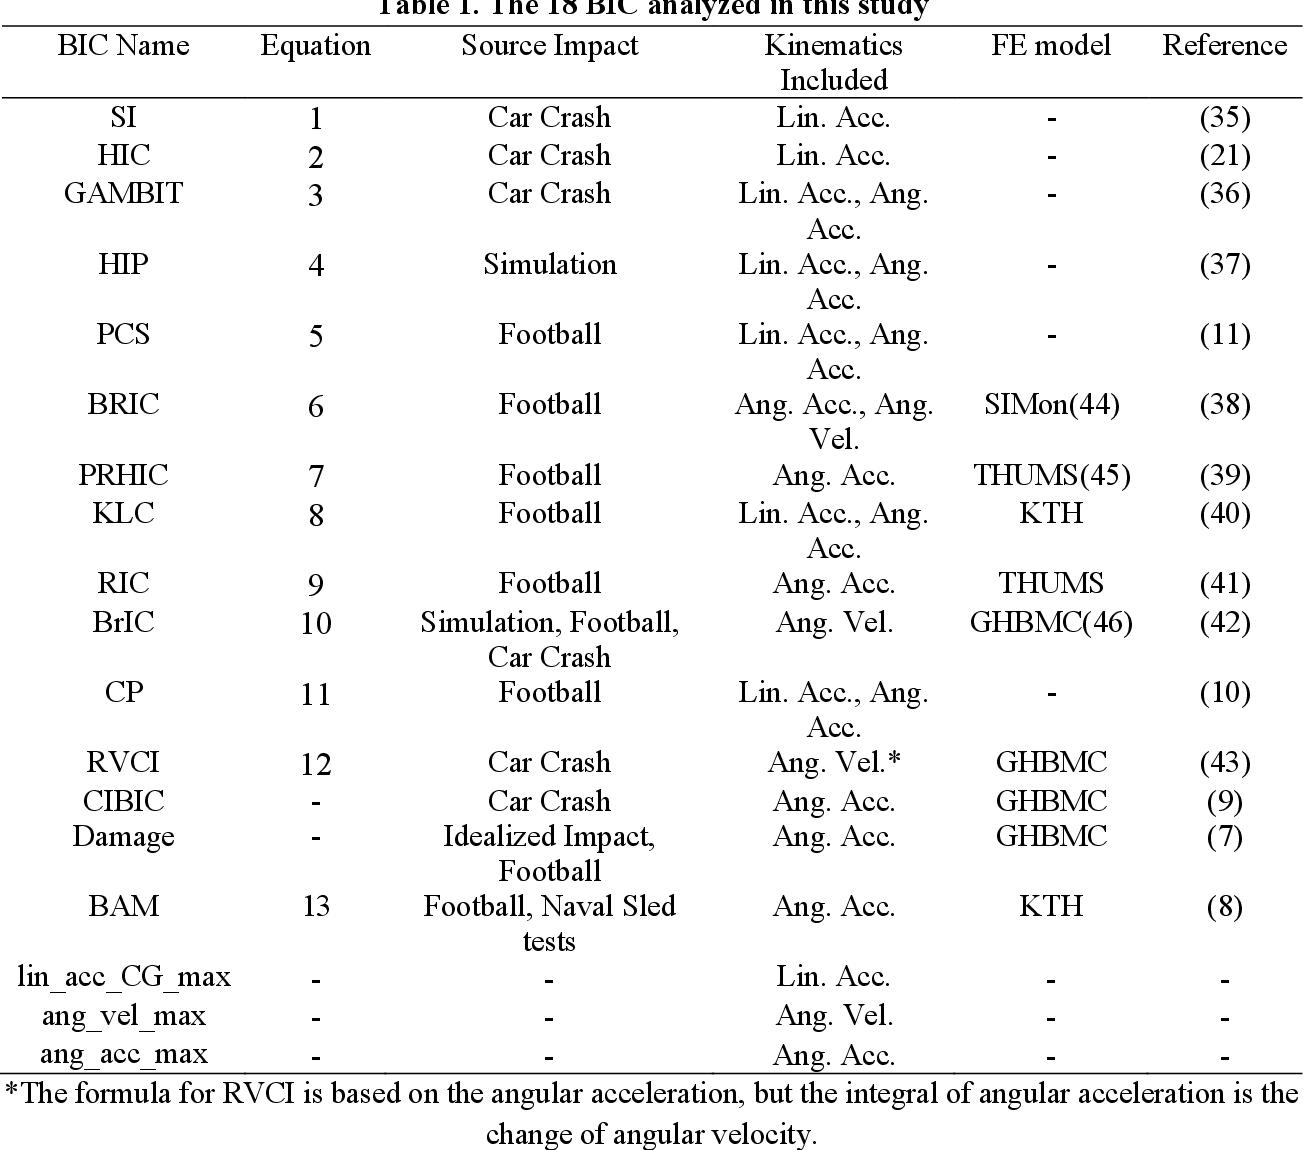 Figure 2 for Prediction of brain strain across head impact subtypes using 18 brain injury criteria